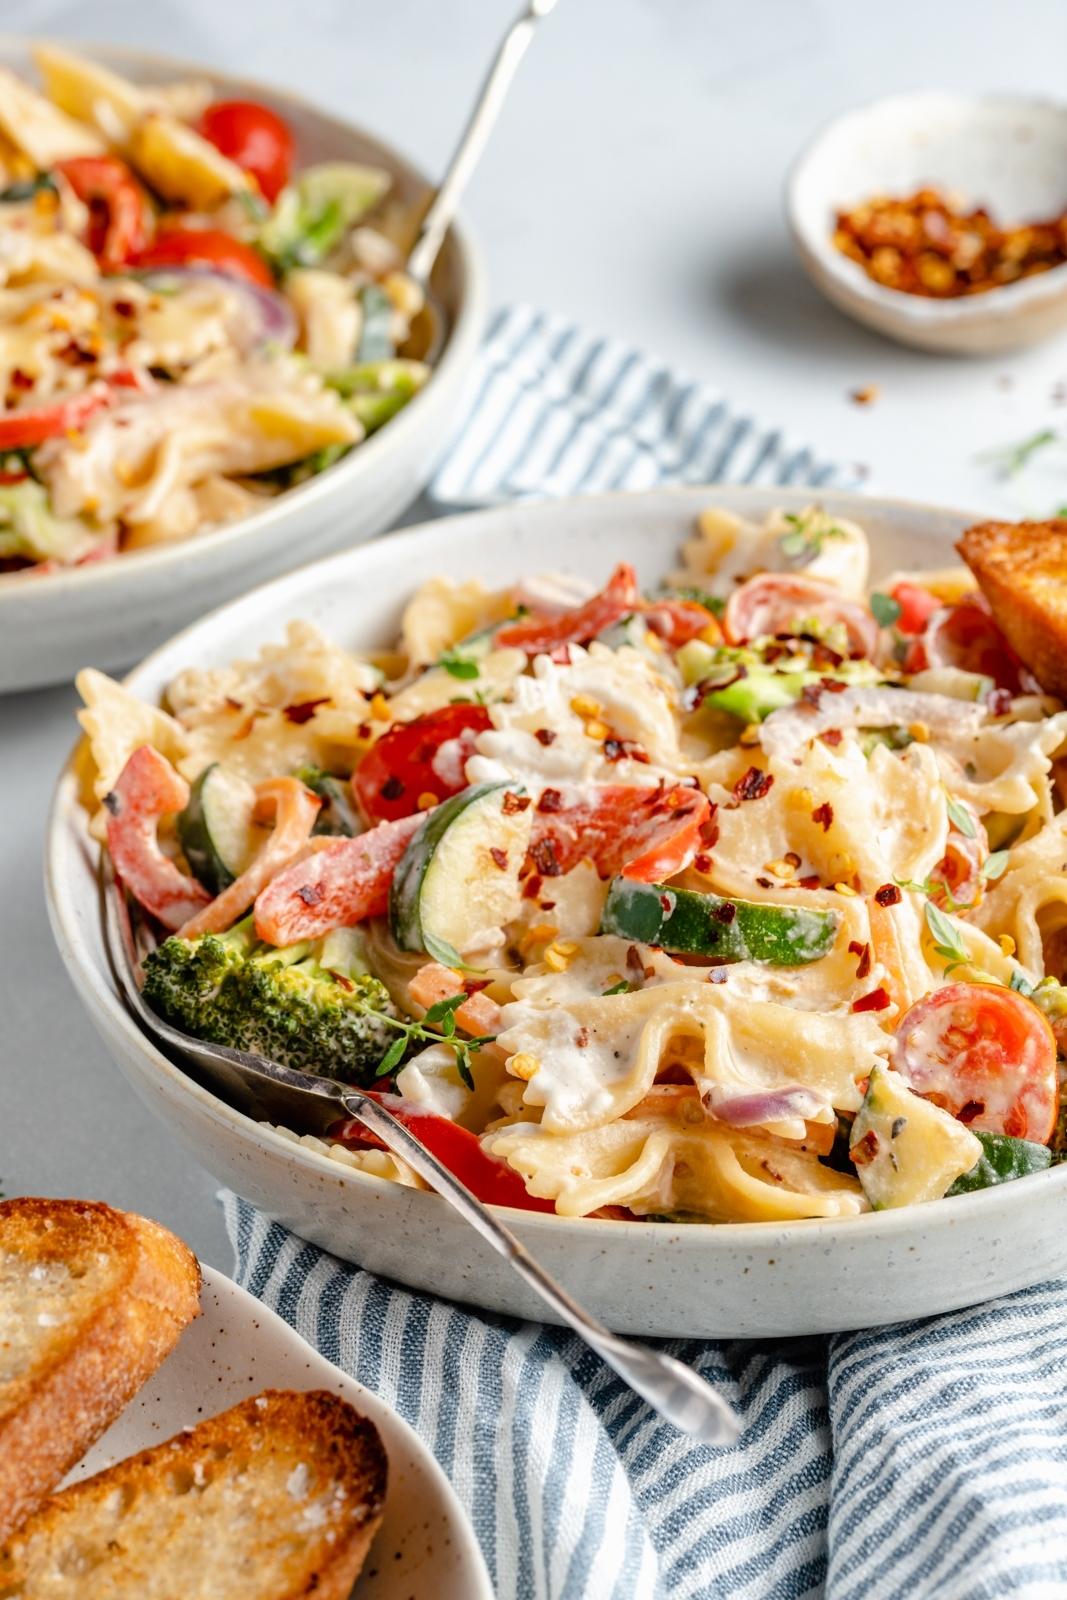 vegan pasta primavera in a bowl with a fork